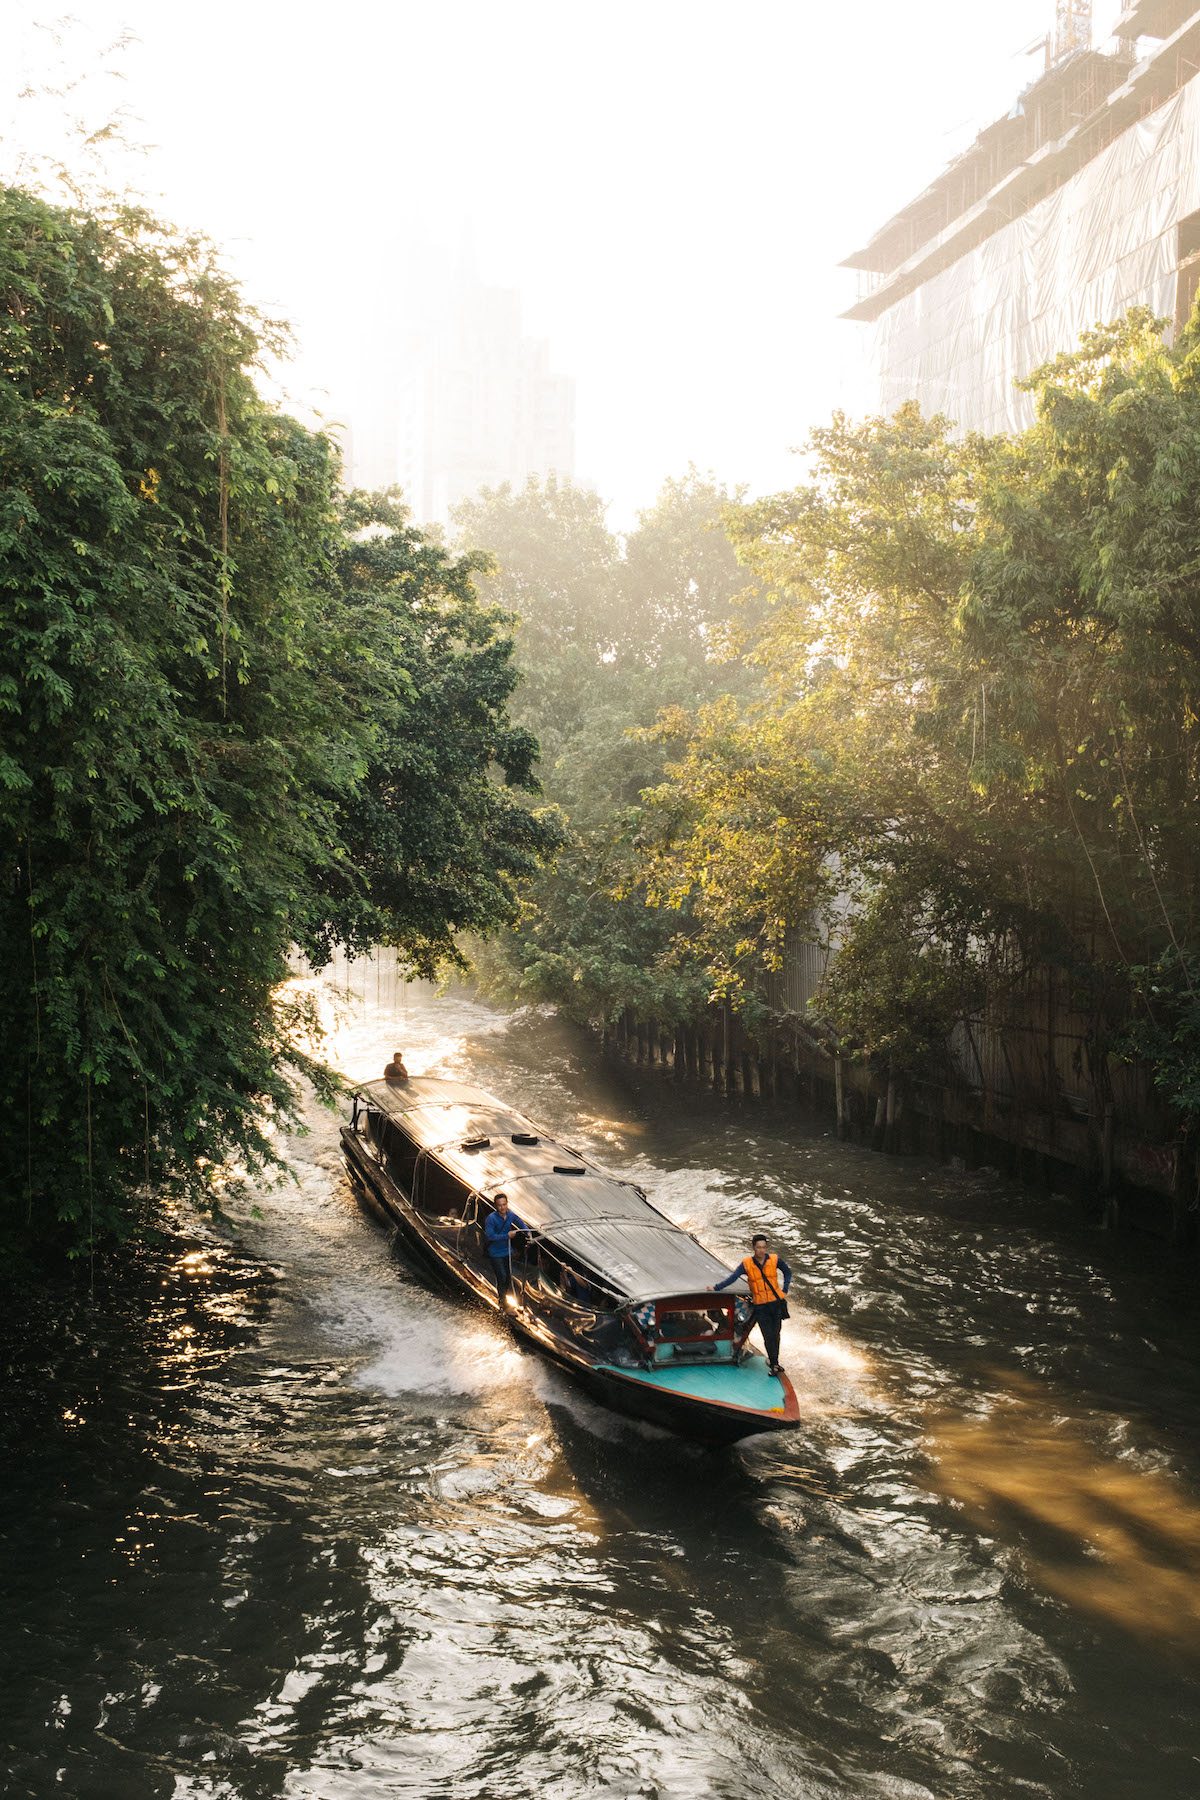 Thailand 2017 002.jpg